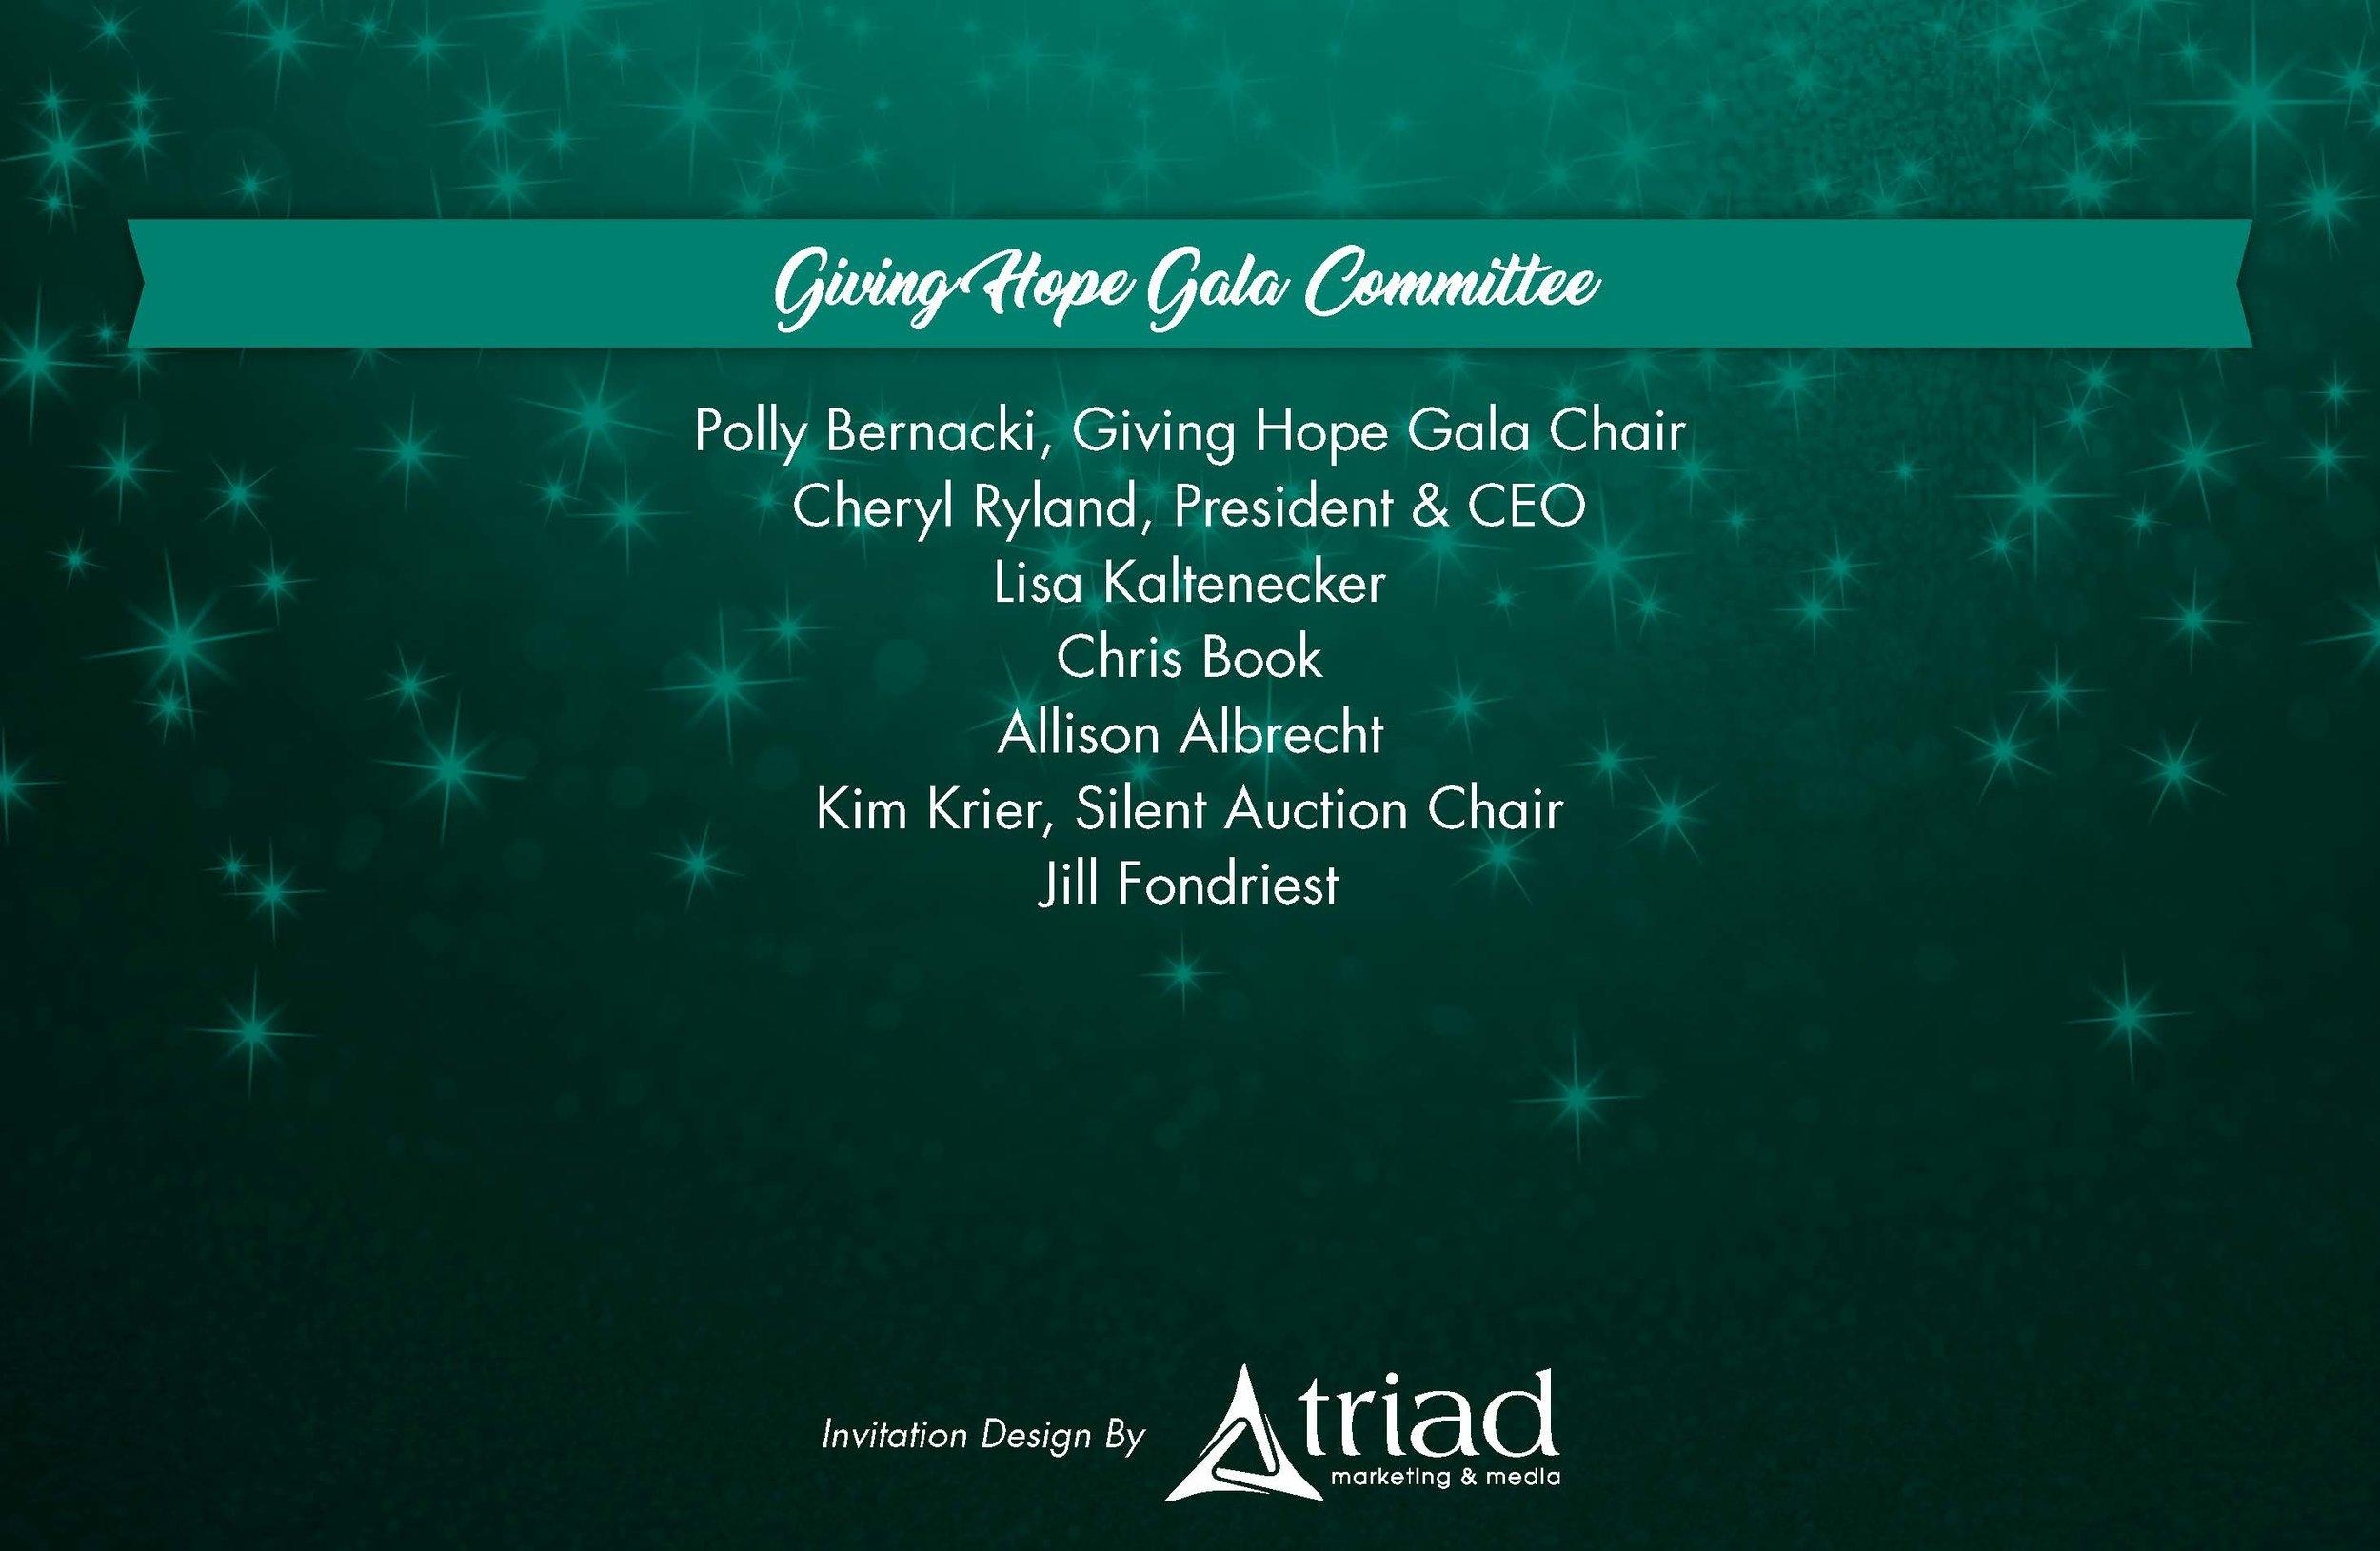 2019 Giving Hope Gala Invitation_Page_4.jpg